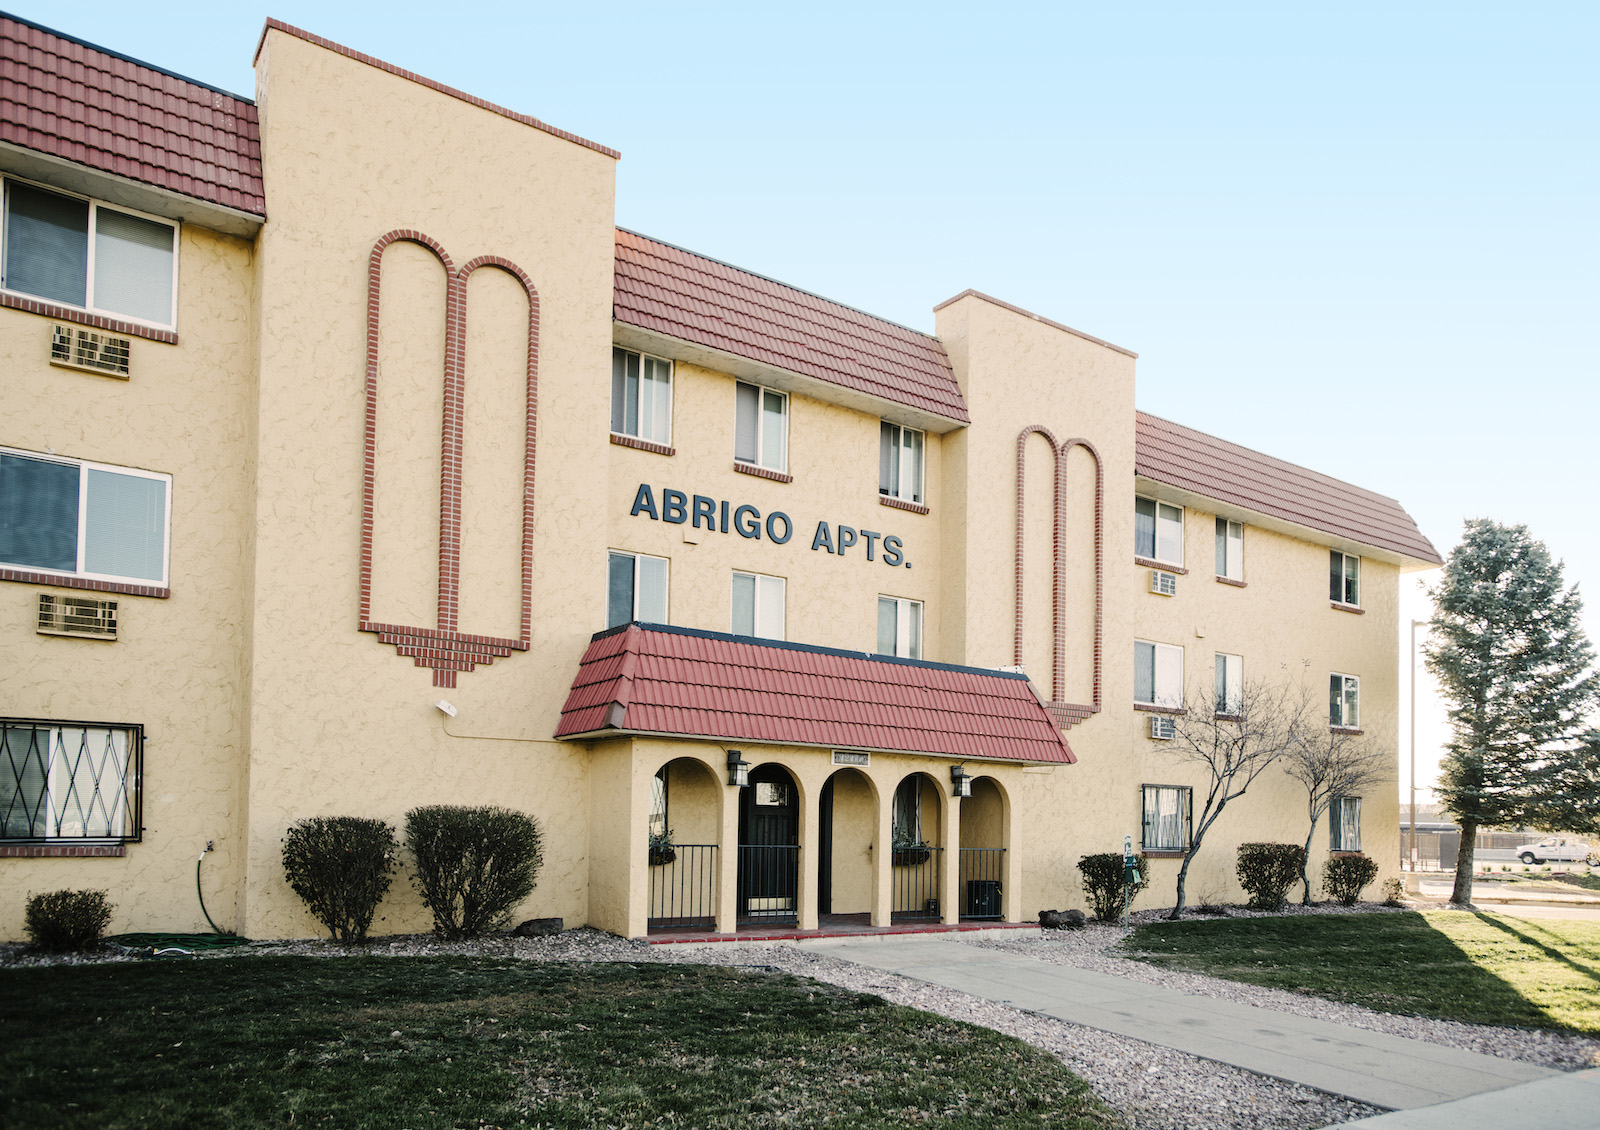 Outside of abrigo apartments